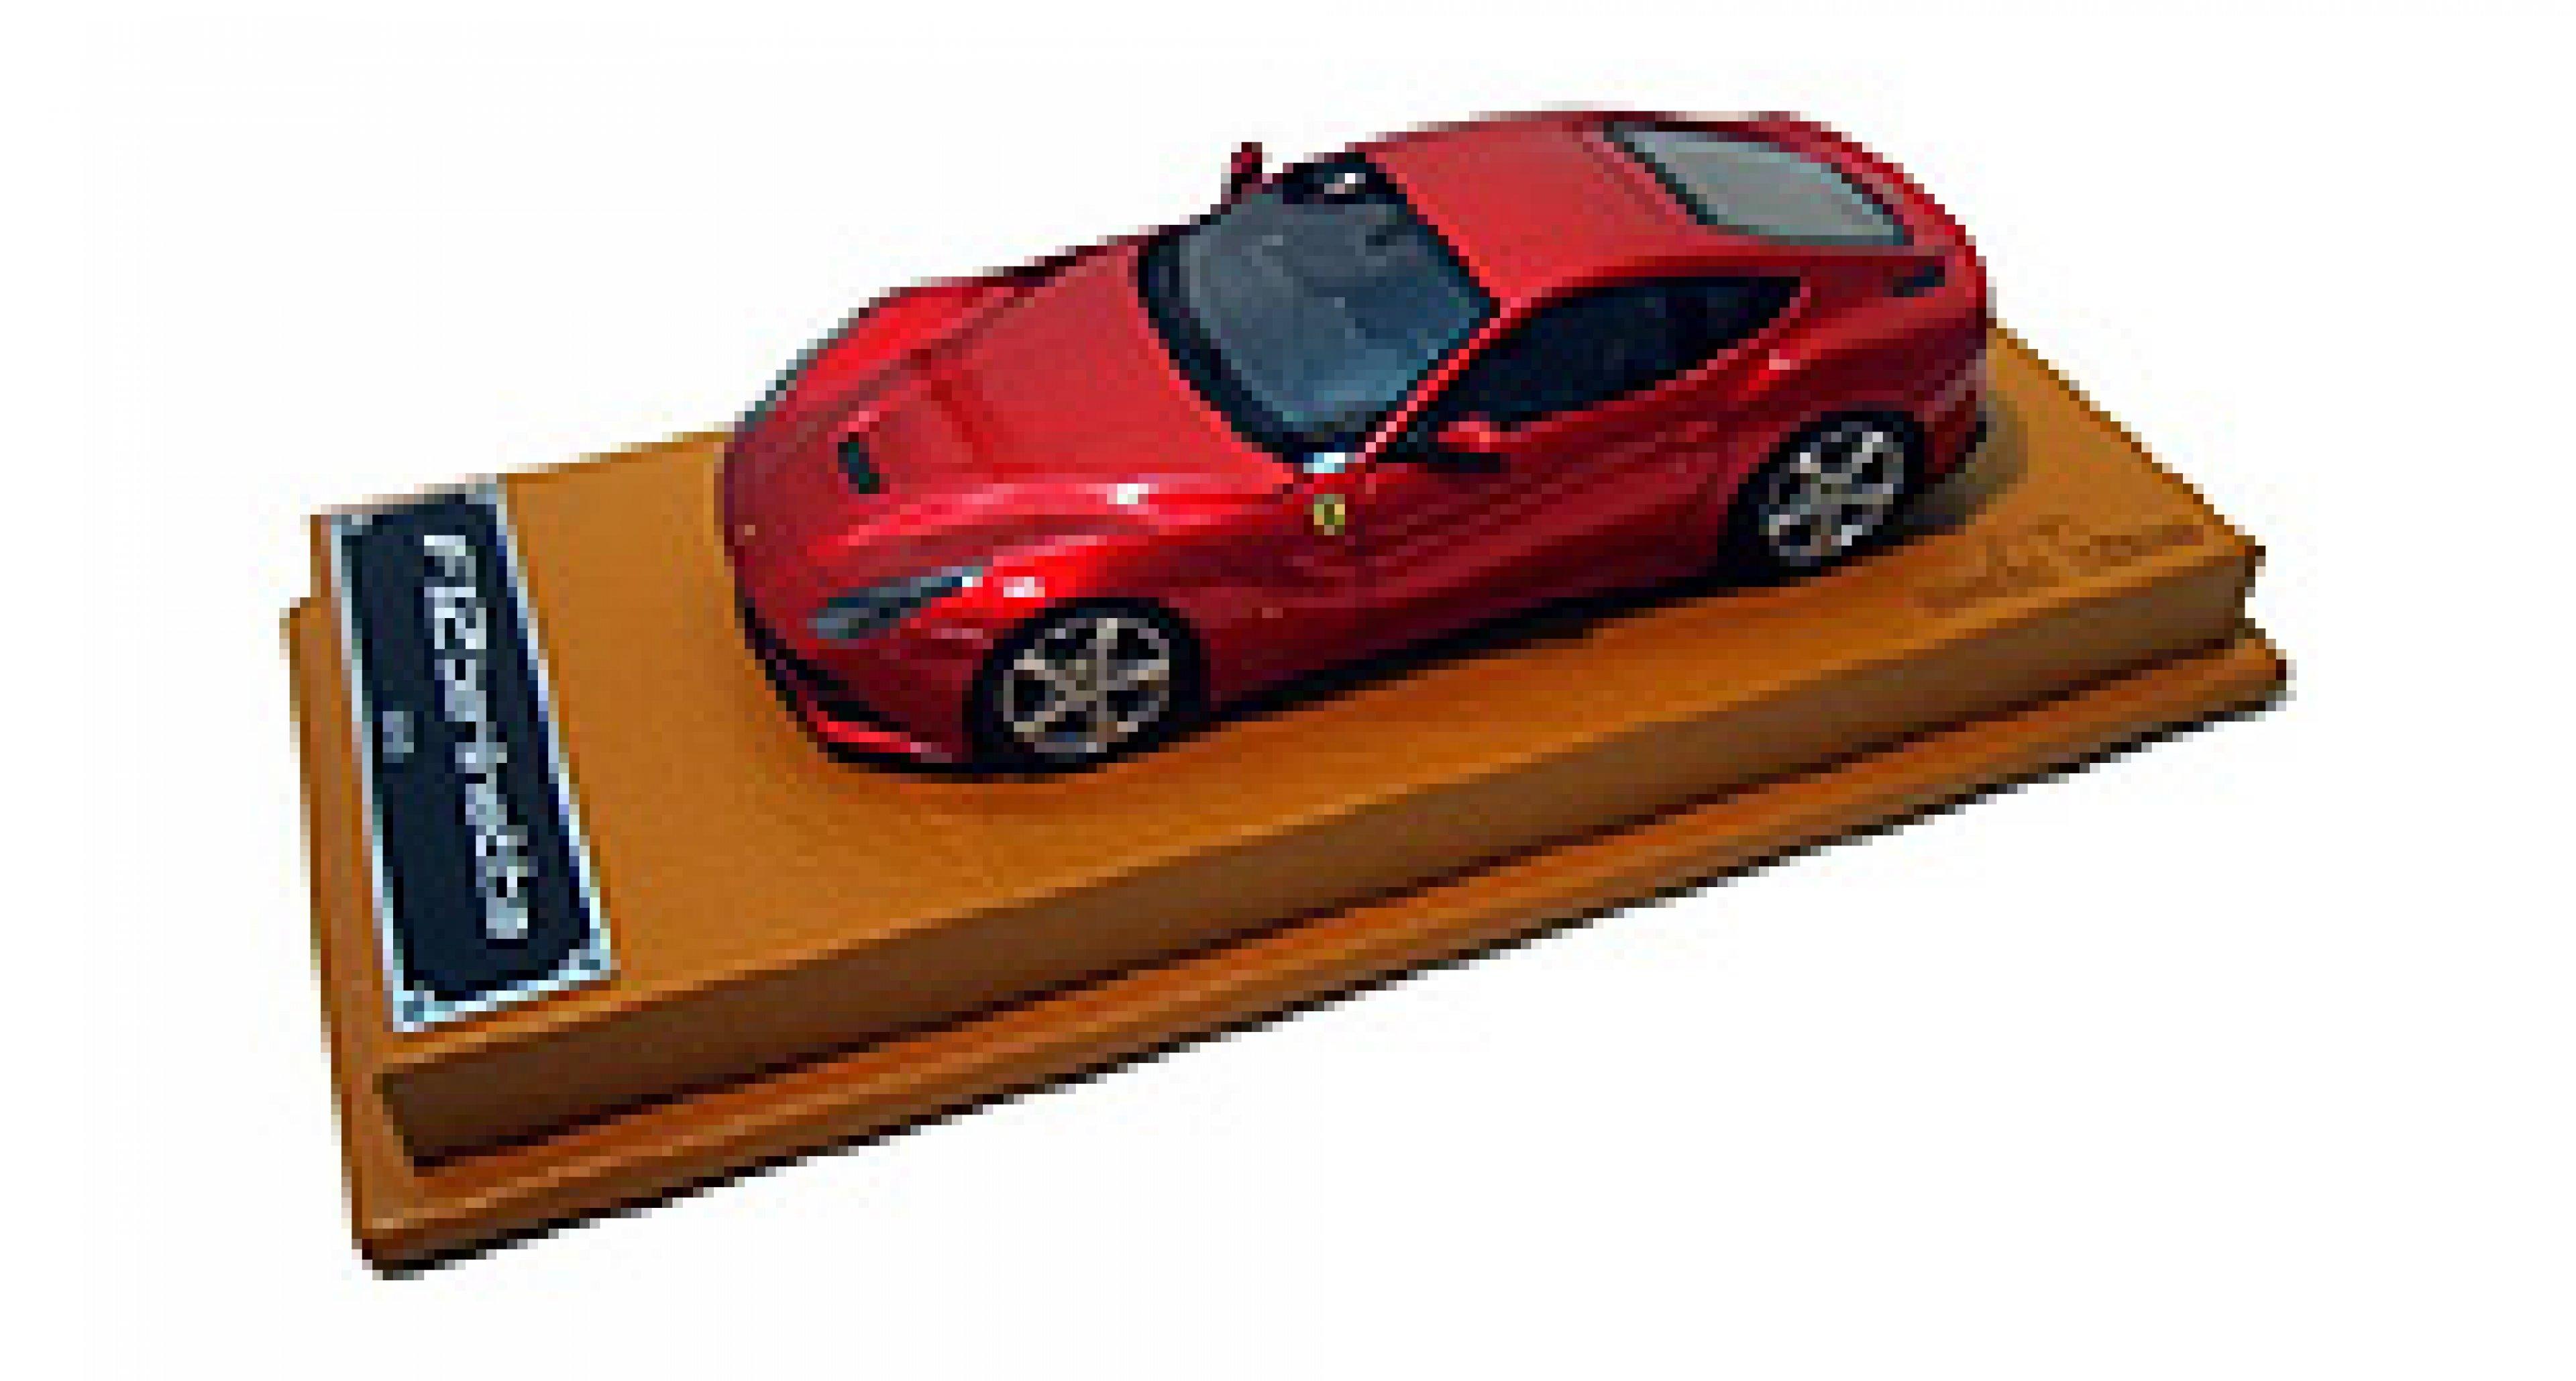 Ferrari F12berlinetta Modelauto: Power-Ferrari im Maßstab 1:43